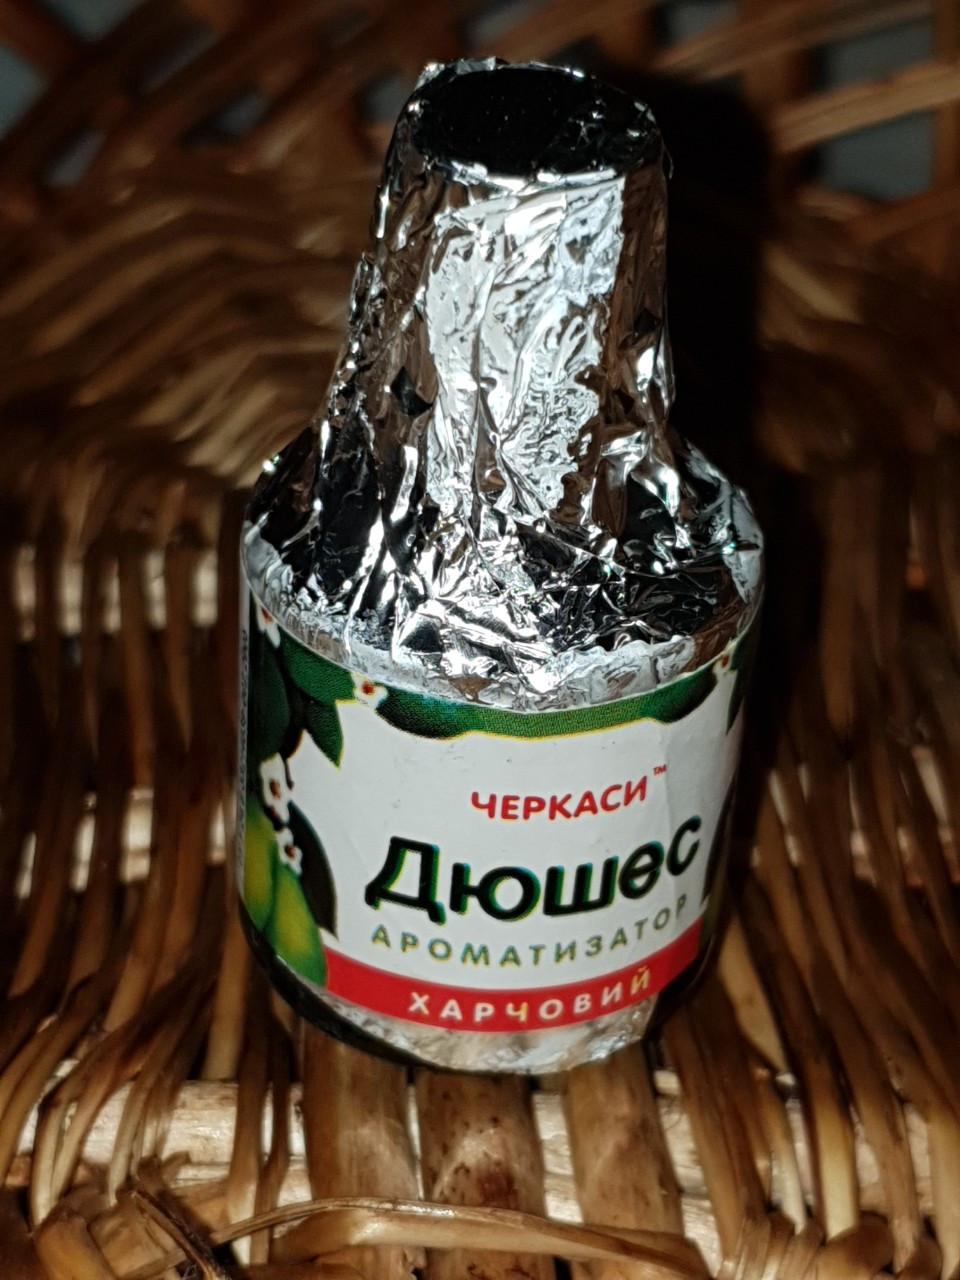 Ароматизатор пищевой Дюшес 5 мл.